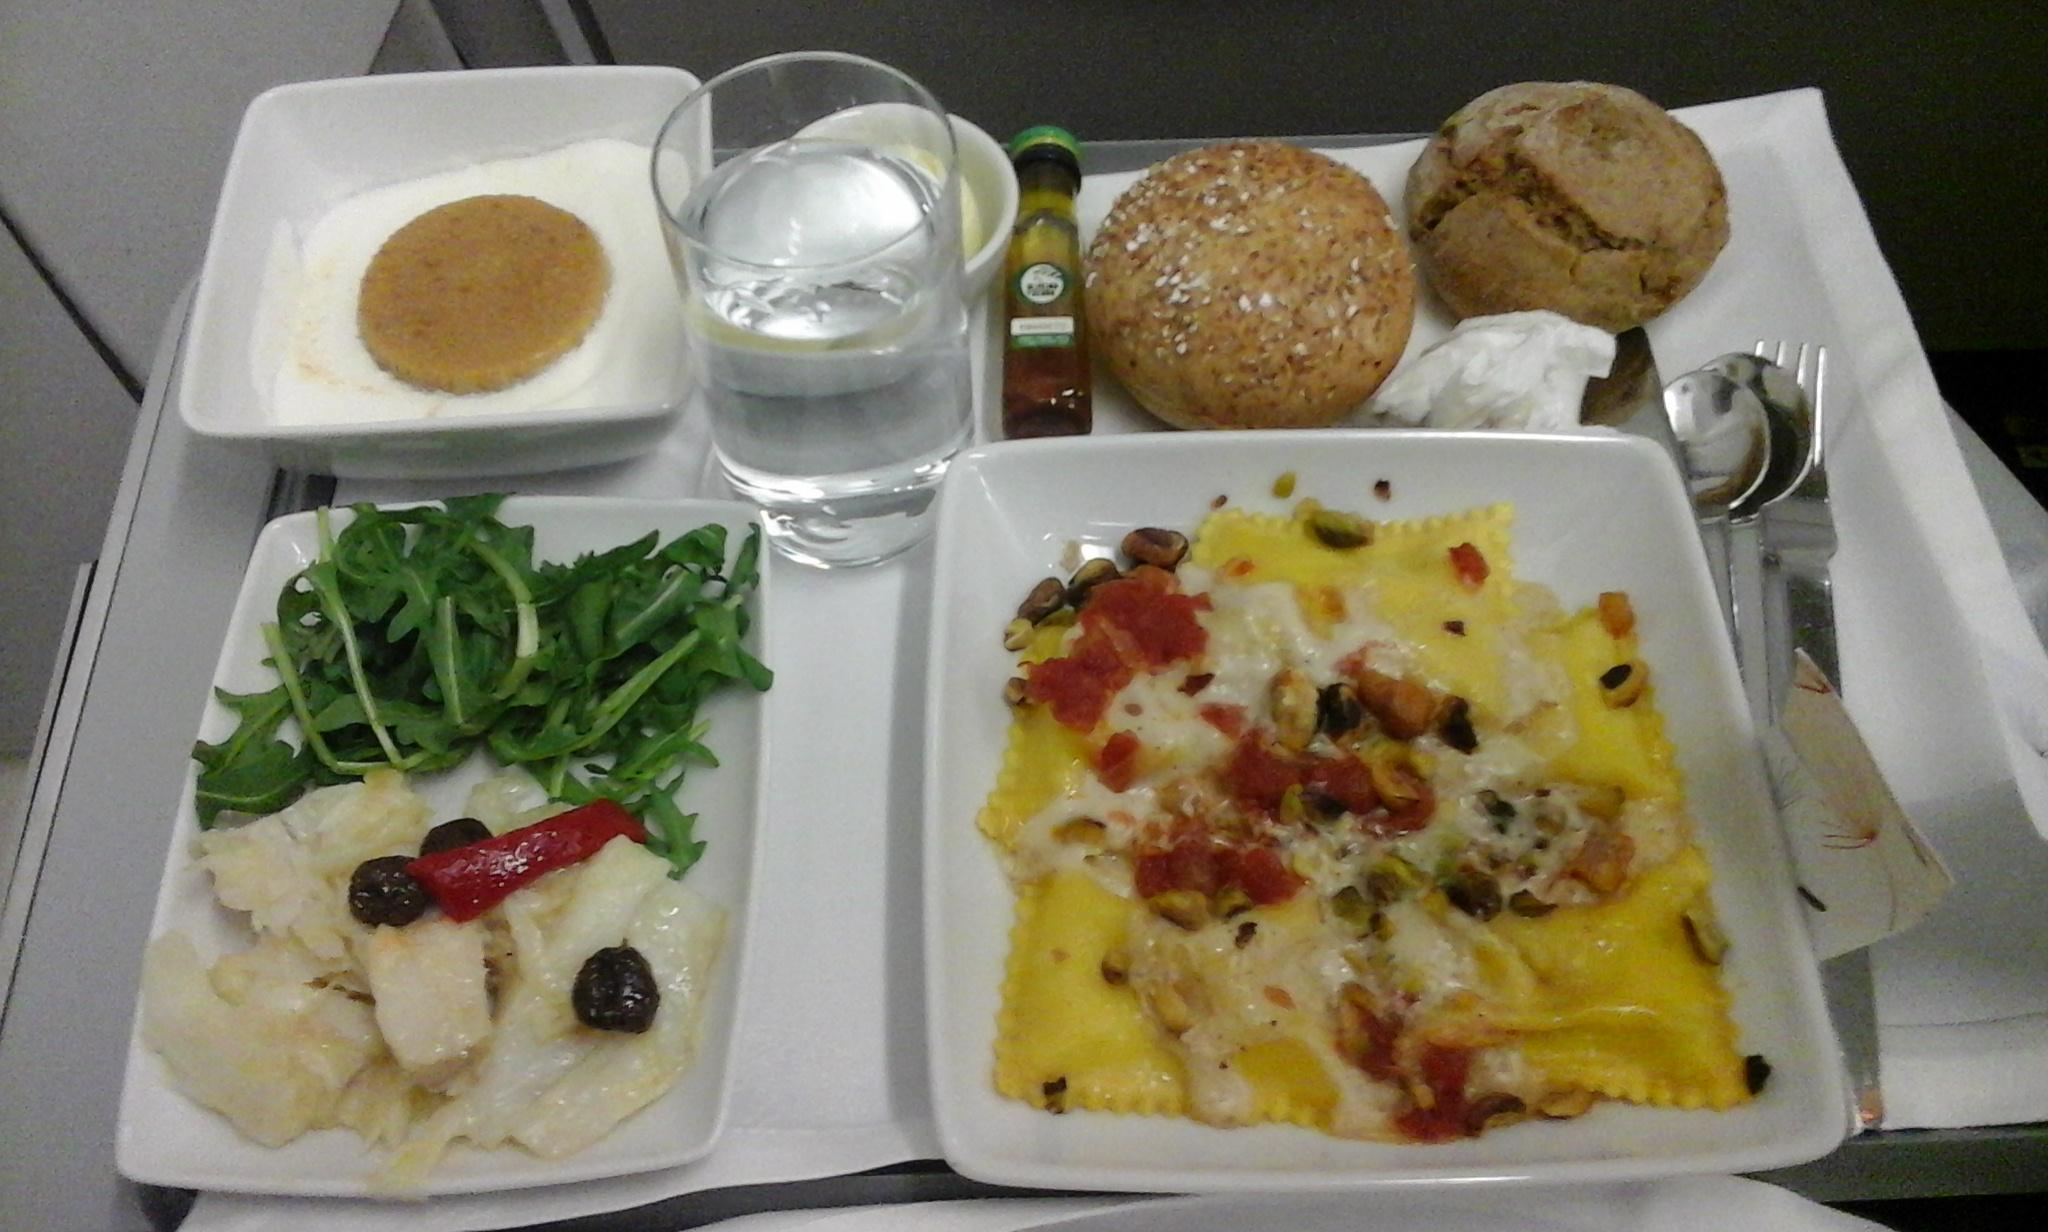 Travel & Food: Europe needs more international food